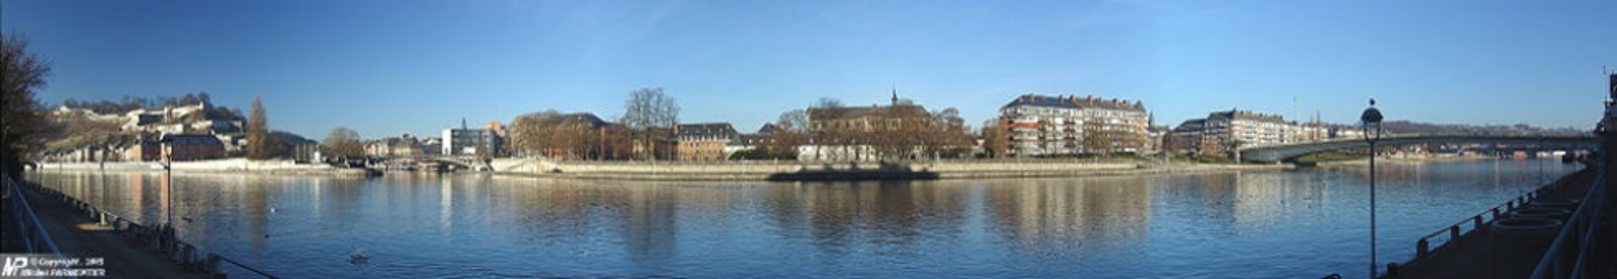 Les Spitants de Namur, asbl - NA029